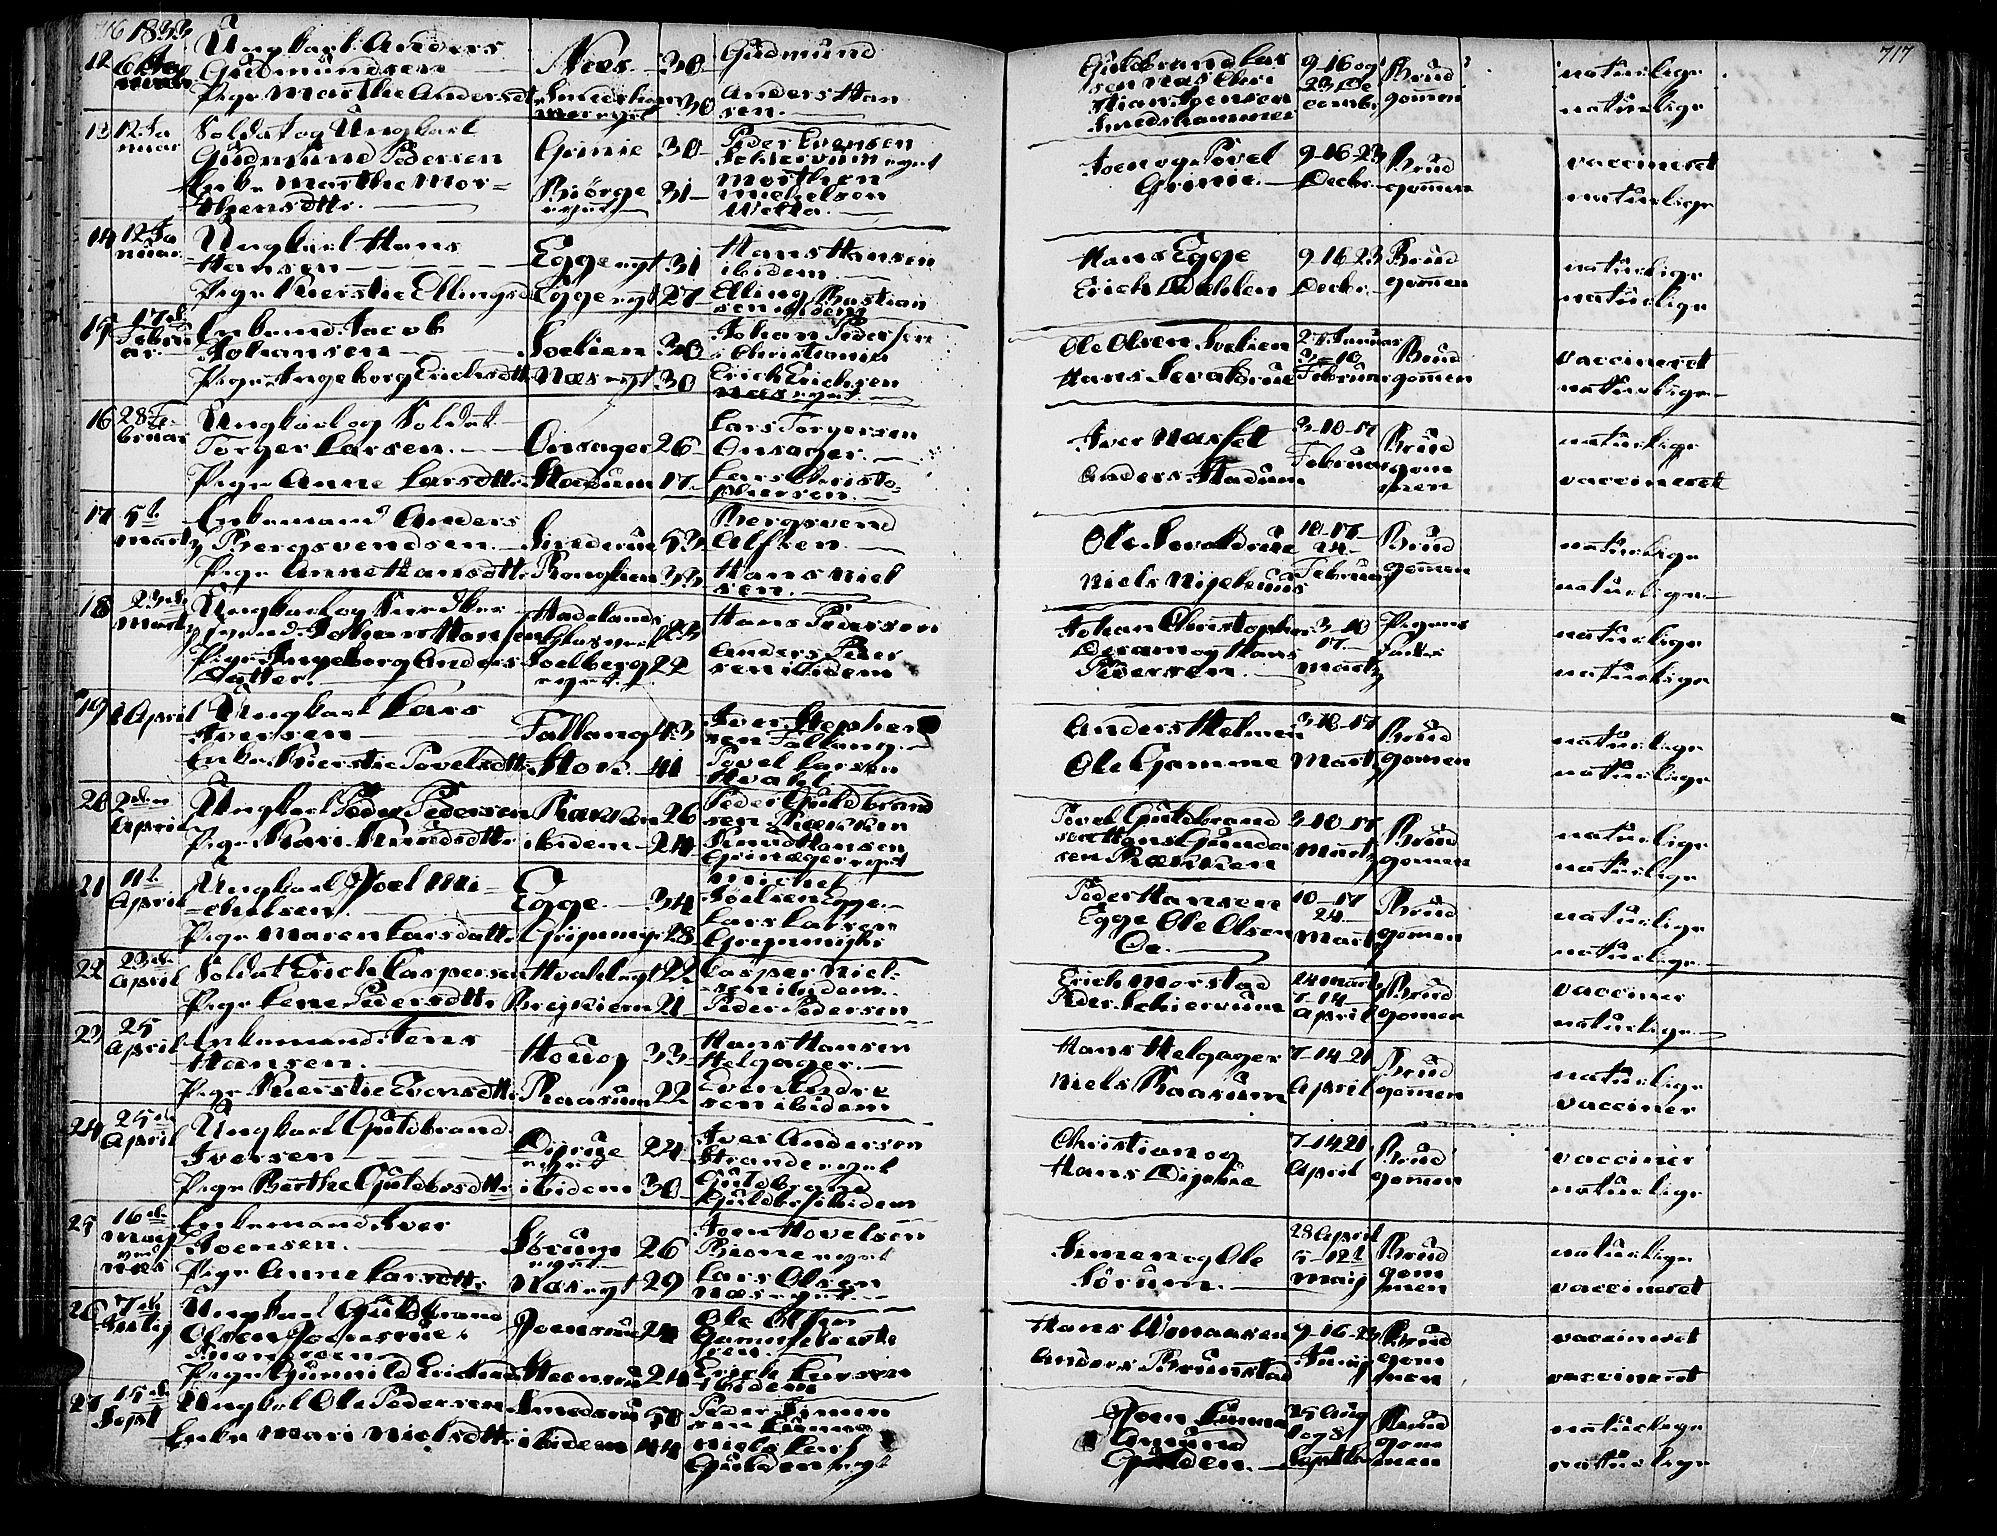 SAH, Gran prestekontor, Ministerialbok nr. 10, 1824-1842, s. 716-717